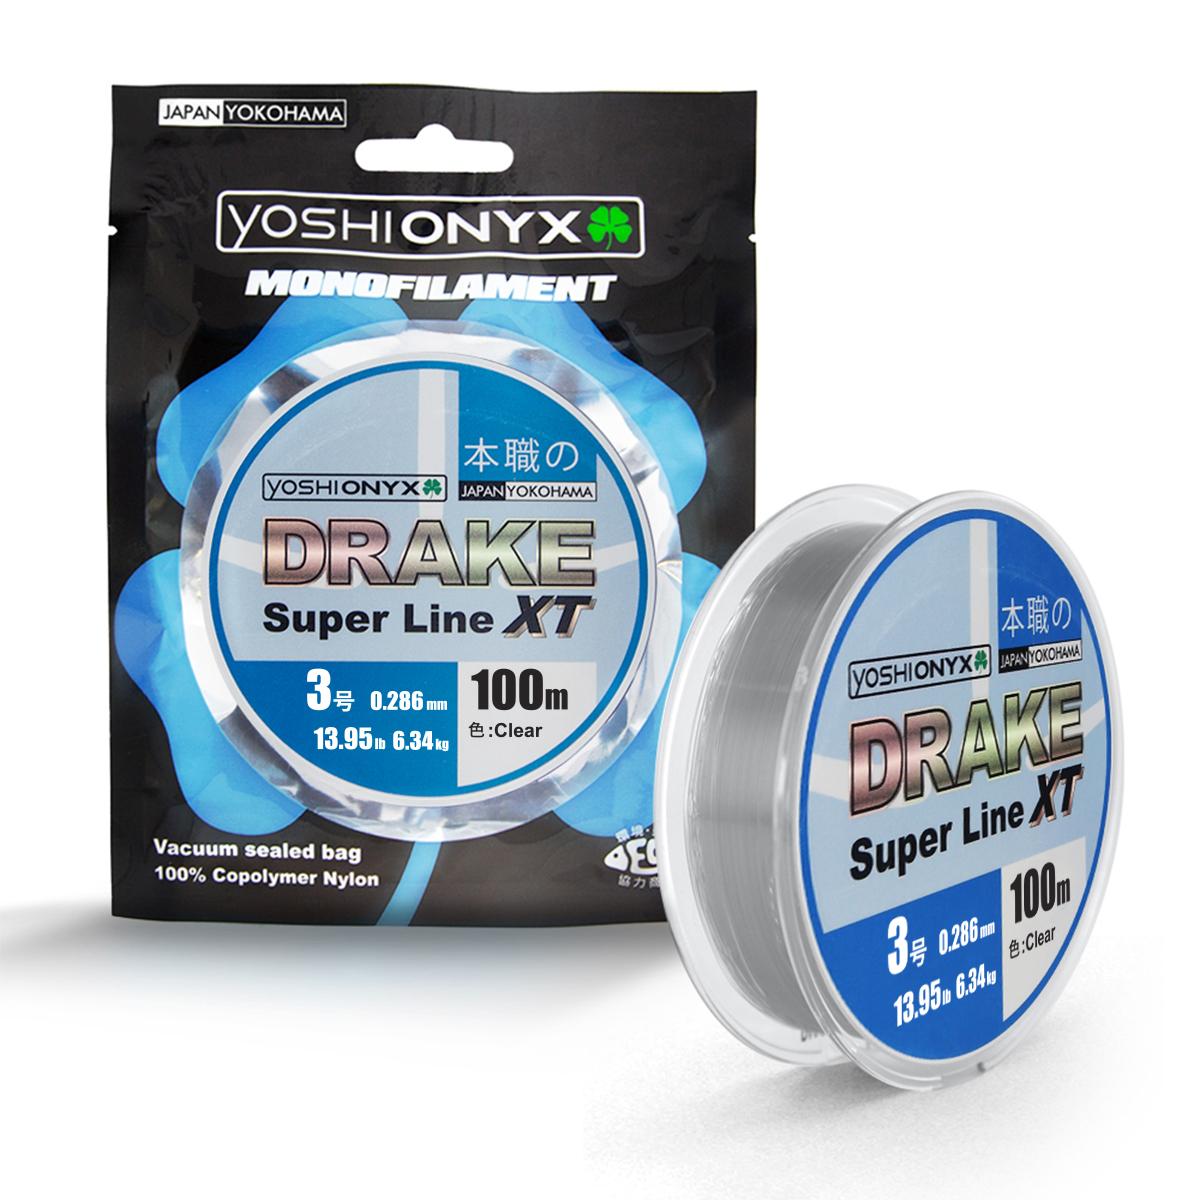 Леска Yoshi Onyx Drake Superline XT, 100 м, 0,286 мм, цвет: Clear